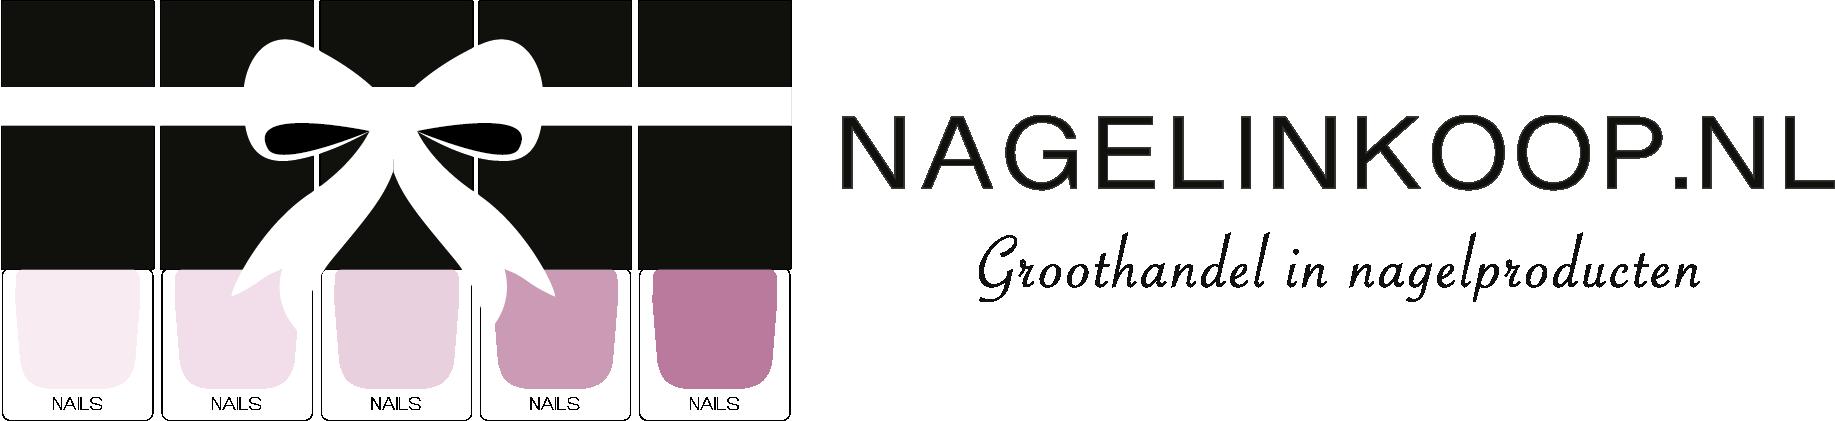 Nagelinkoop.nl